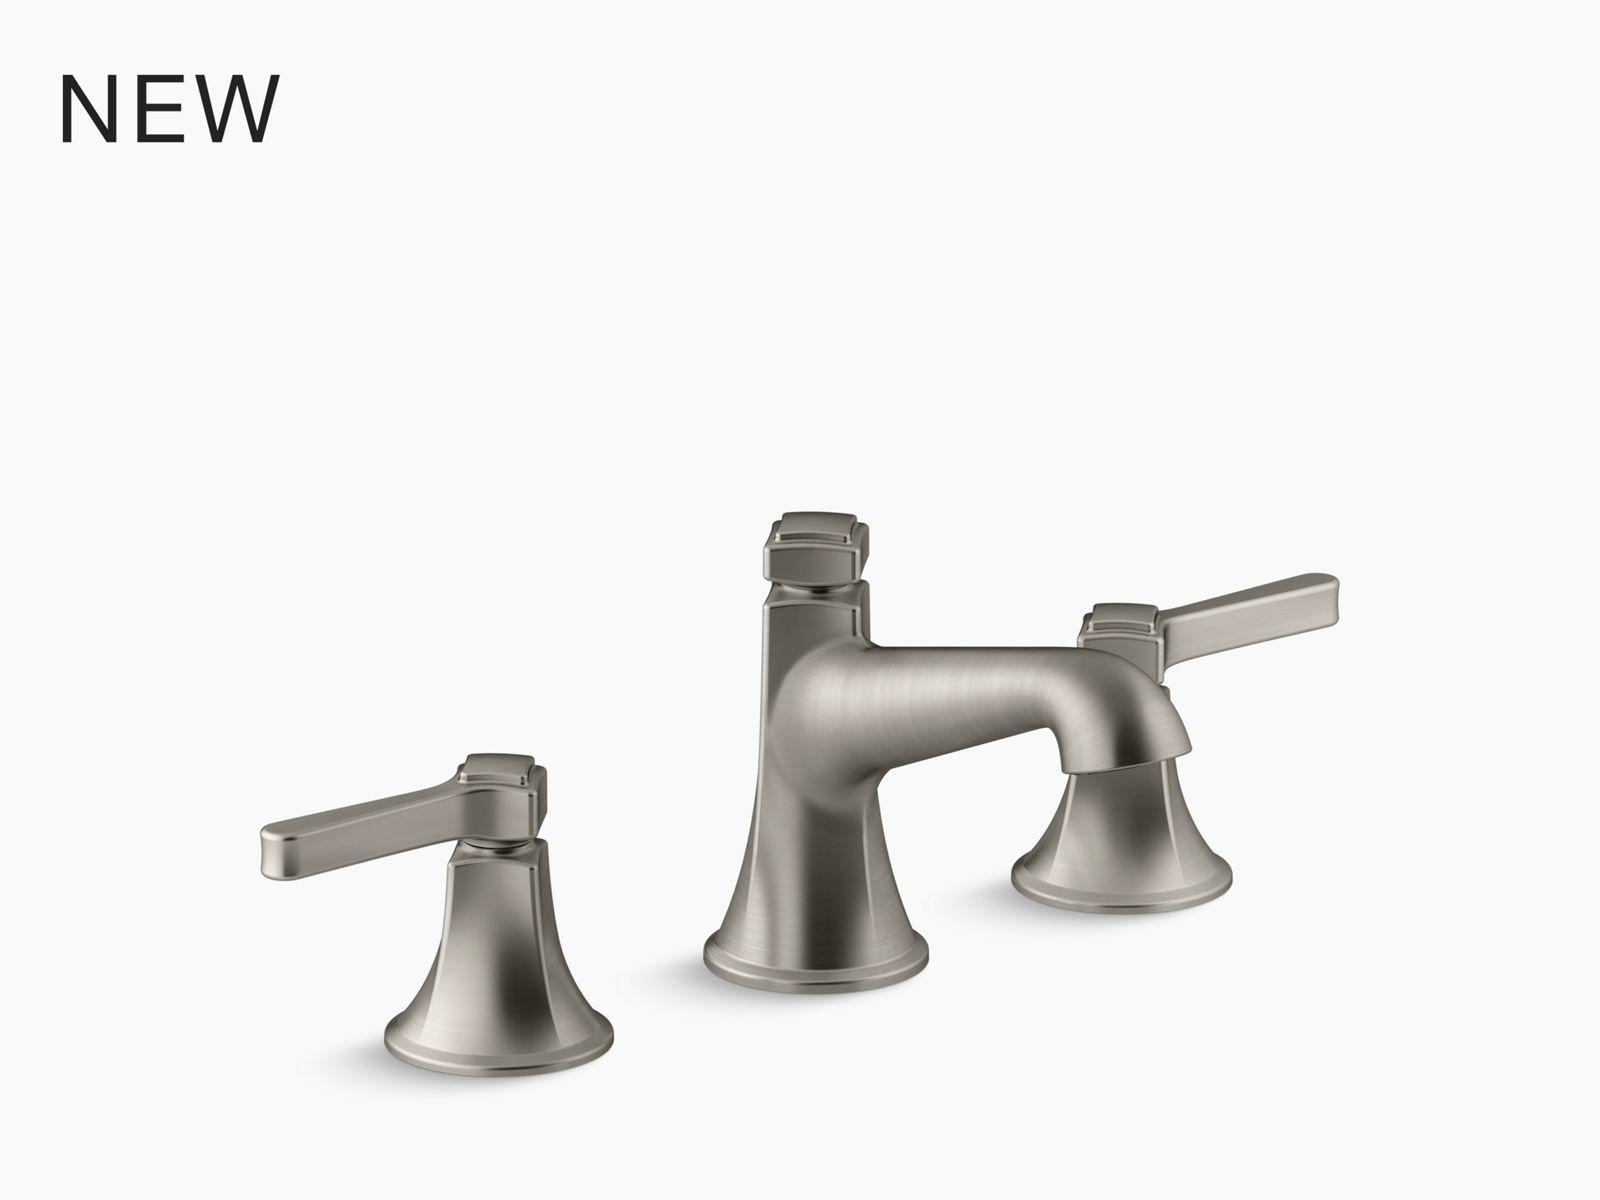 bancroft monoblock single hole bathroom sink faucet with escutcheon and metal lever handles